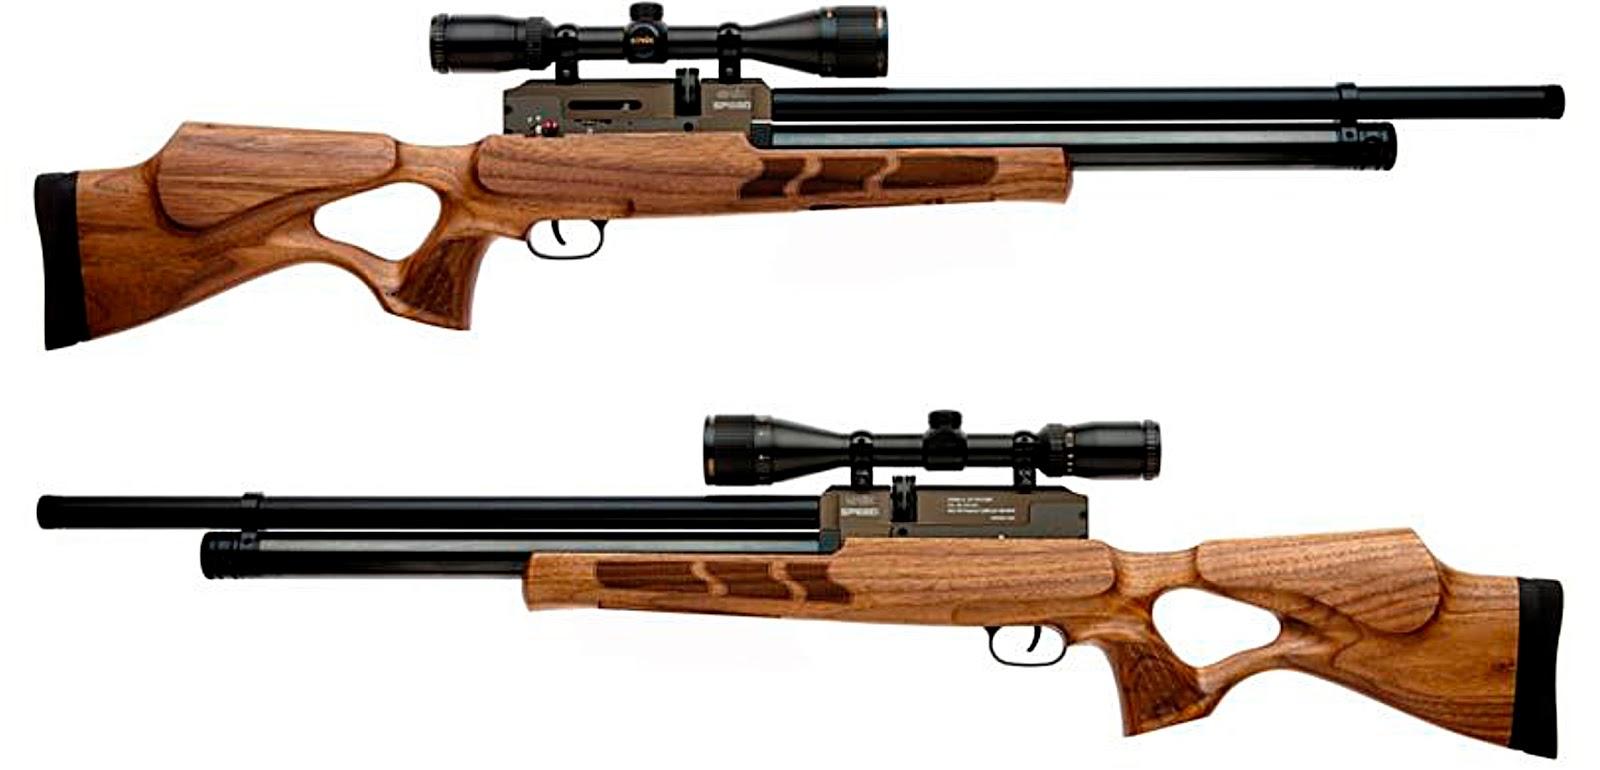 Evanix Conquest Speed Semi Auto Pcp Air Rifle: Senapan Pcp Import: Senapan Pcp Evanix Speed